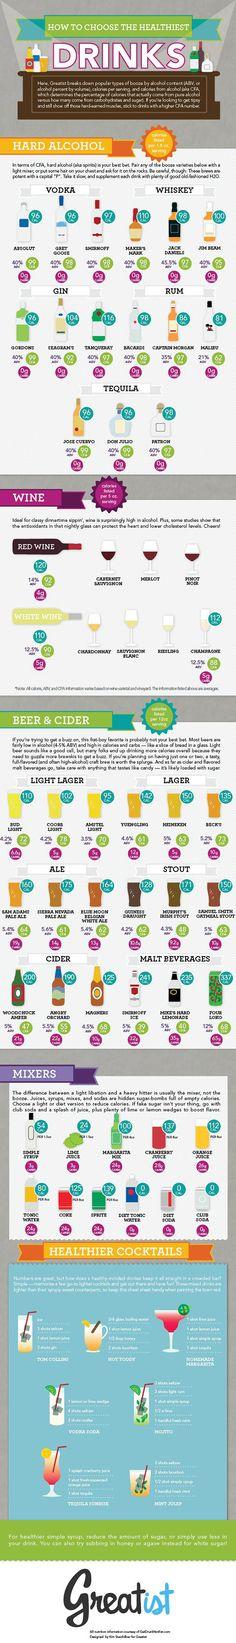 Bottoms Up: Choosing Healthier Drinks